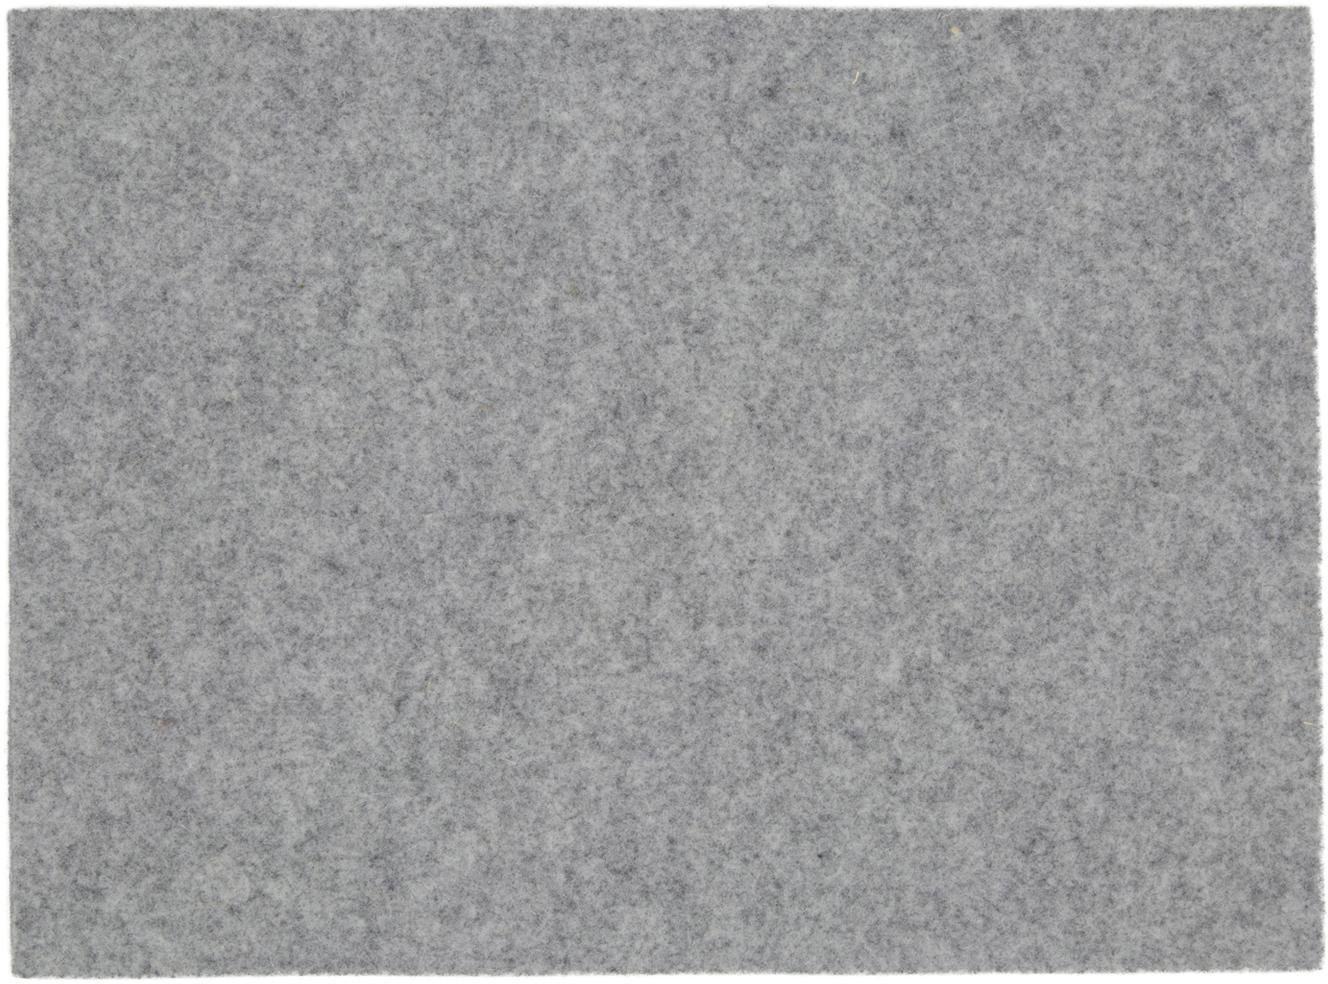 Wollfilz-Tischsets Leandra, 4 Stück, 90% Wolle, 10% Polyethylen, Hellgrau, 33 x 45 cm